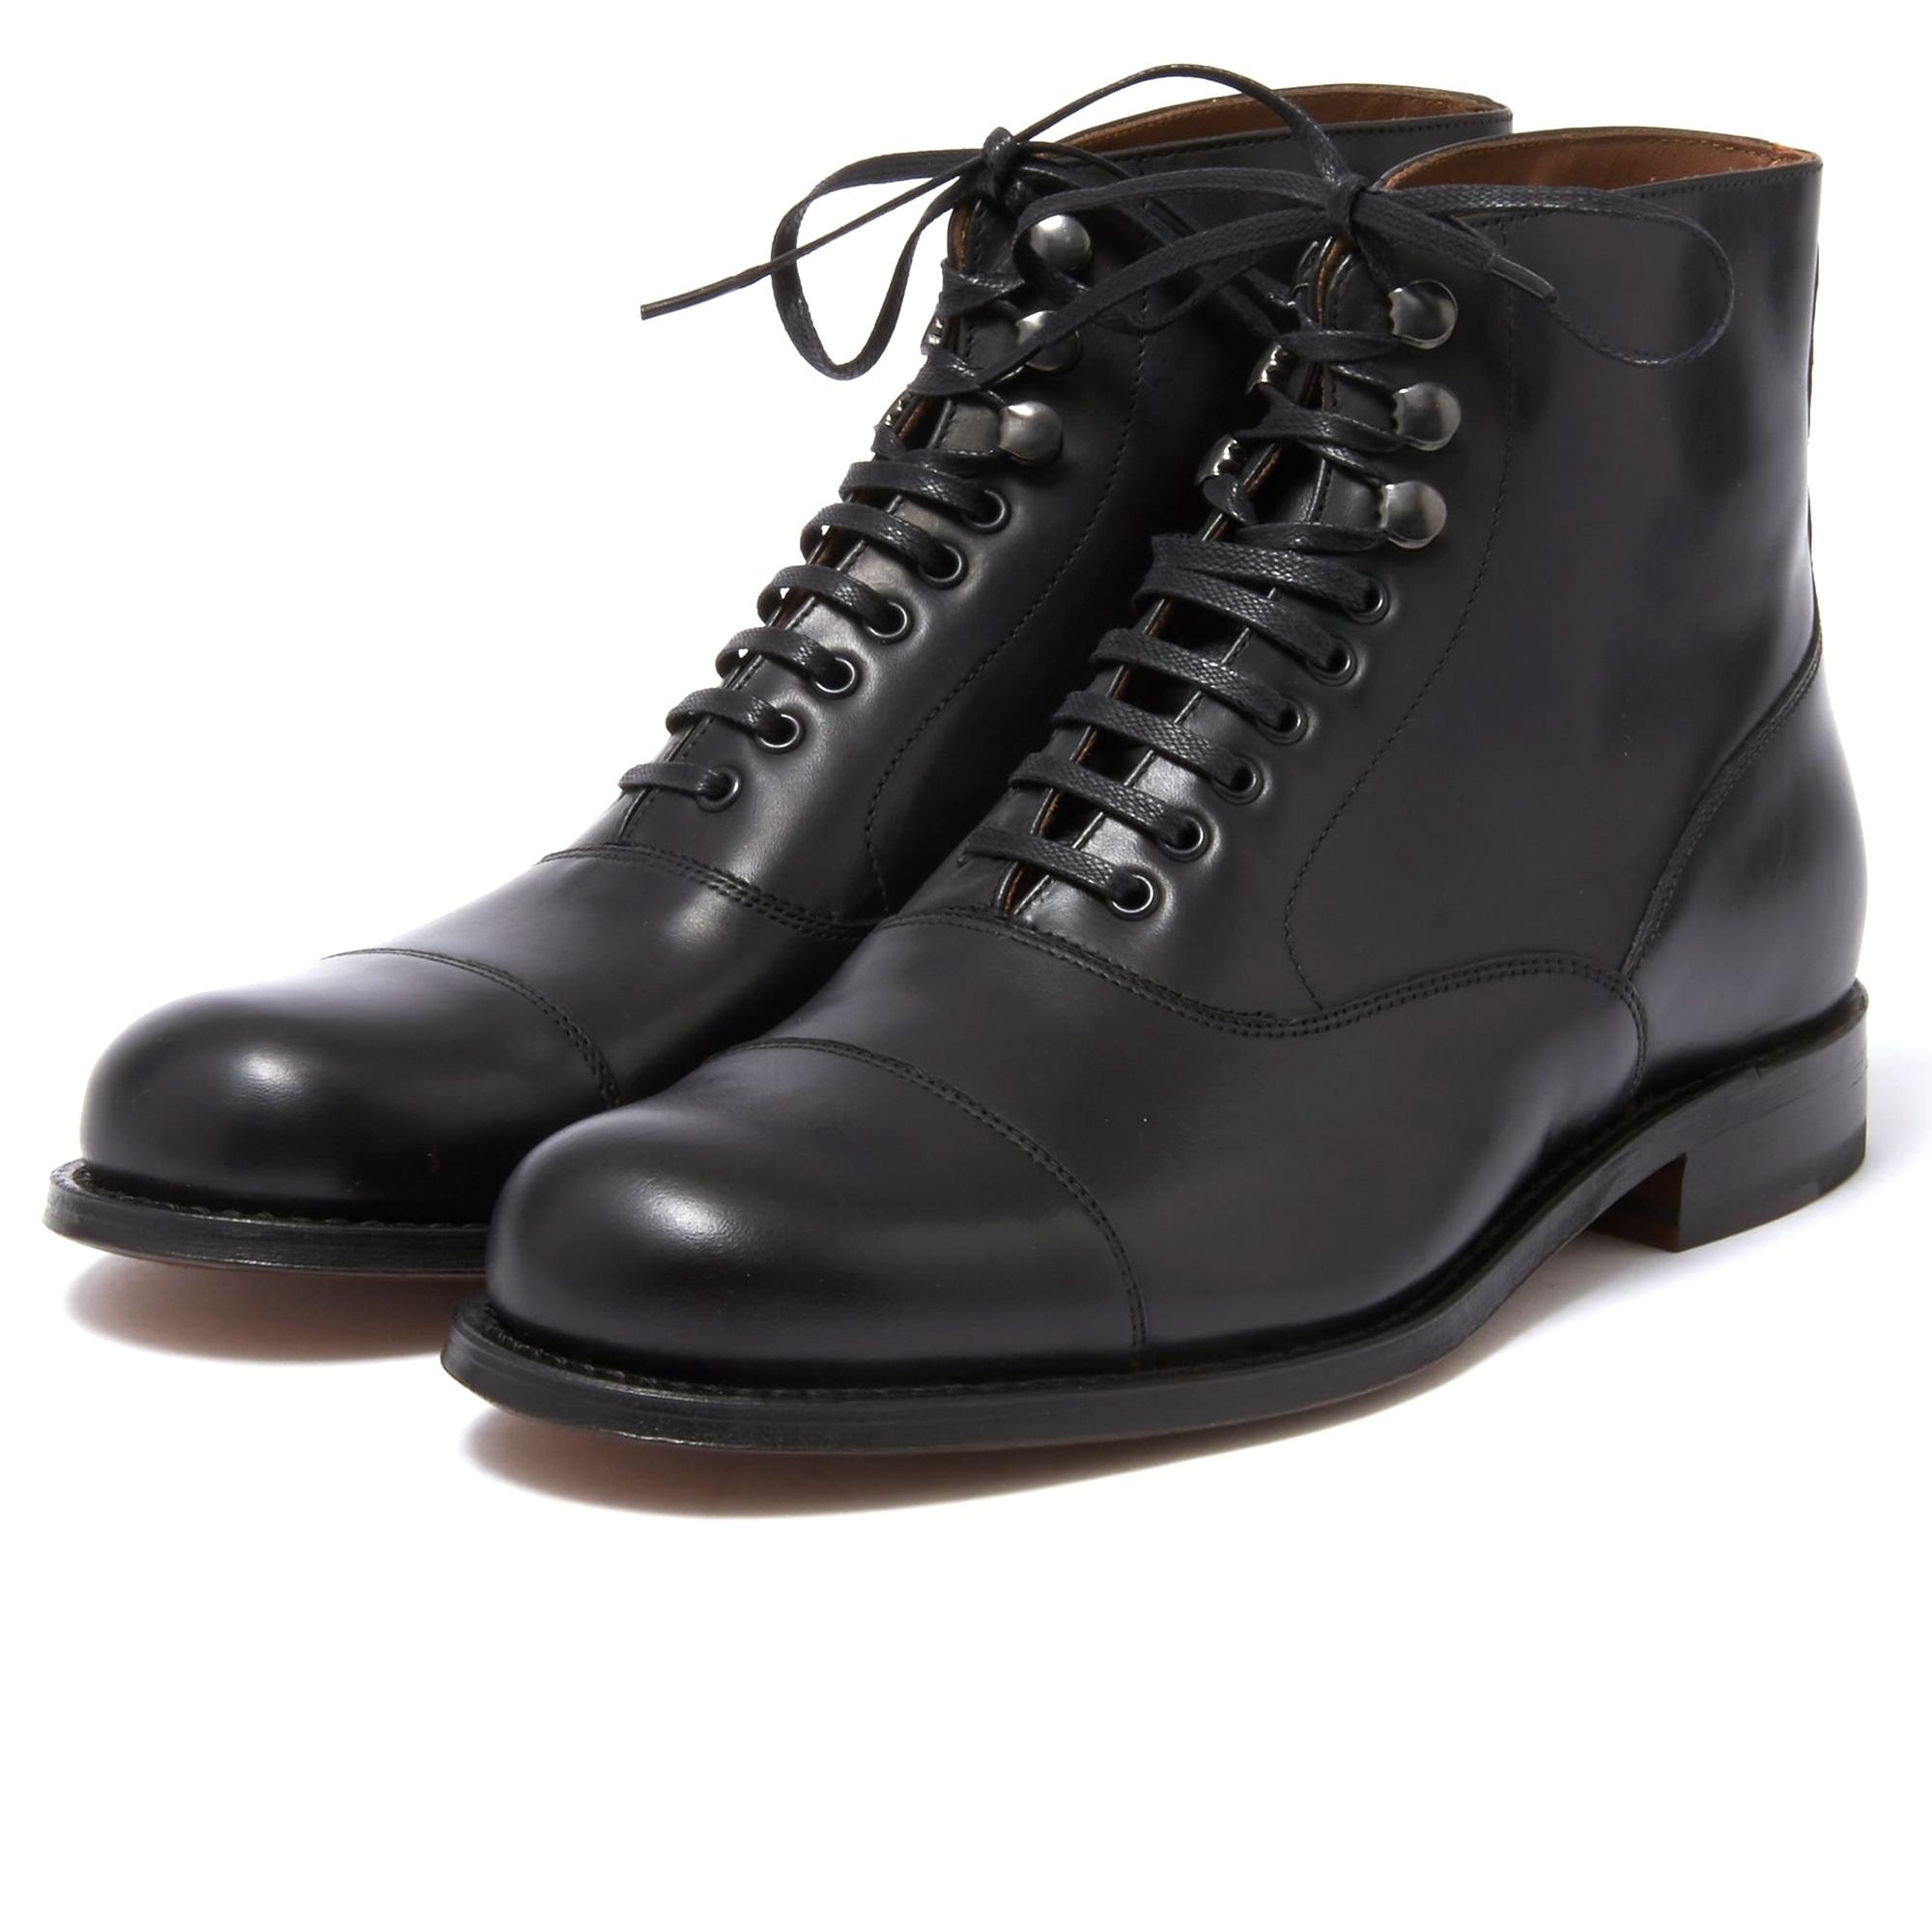 Grenson Leander Oxford Boot (Black) at